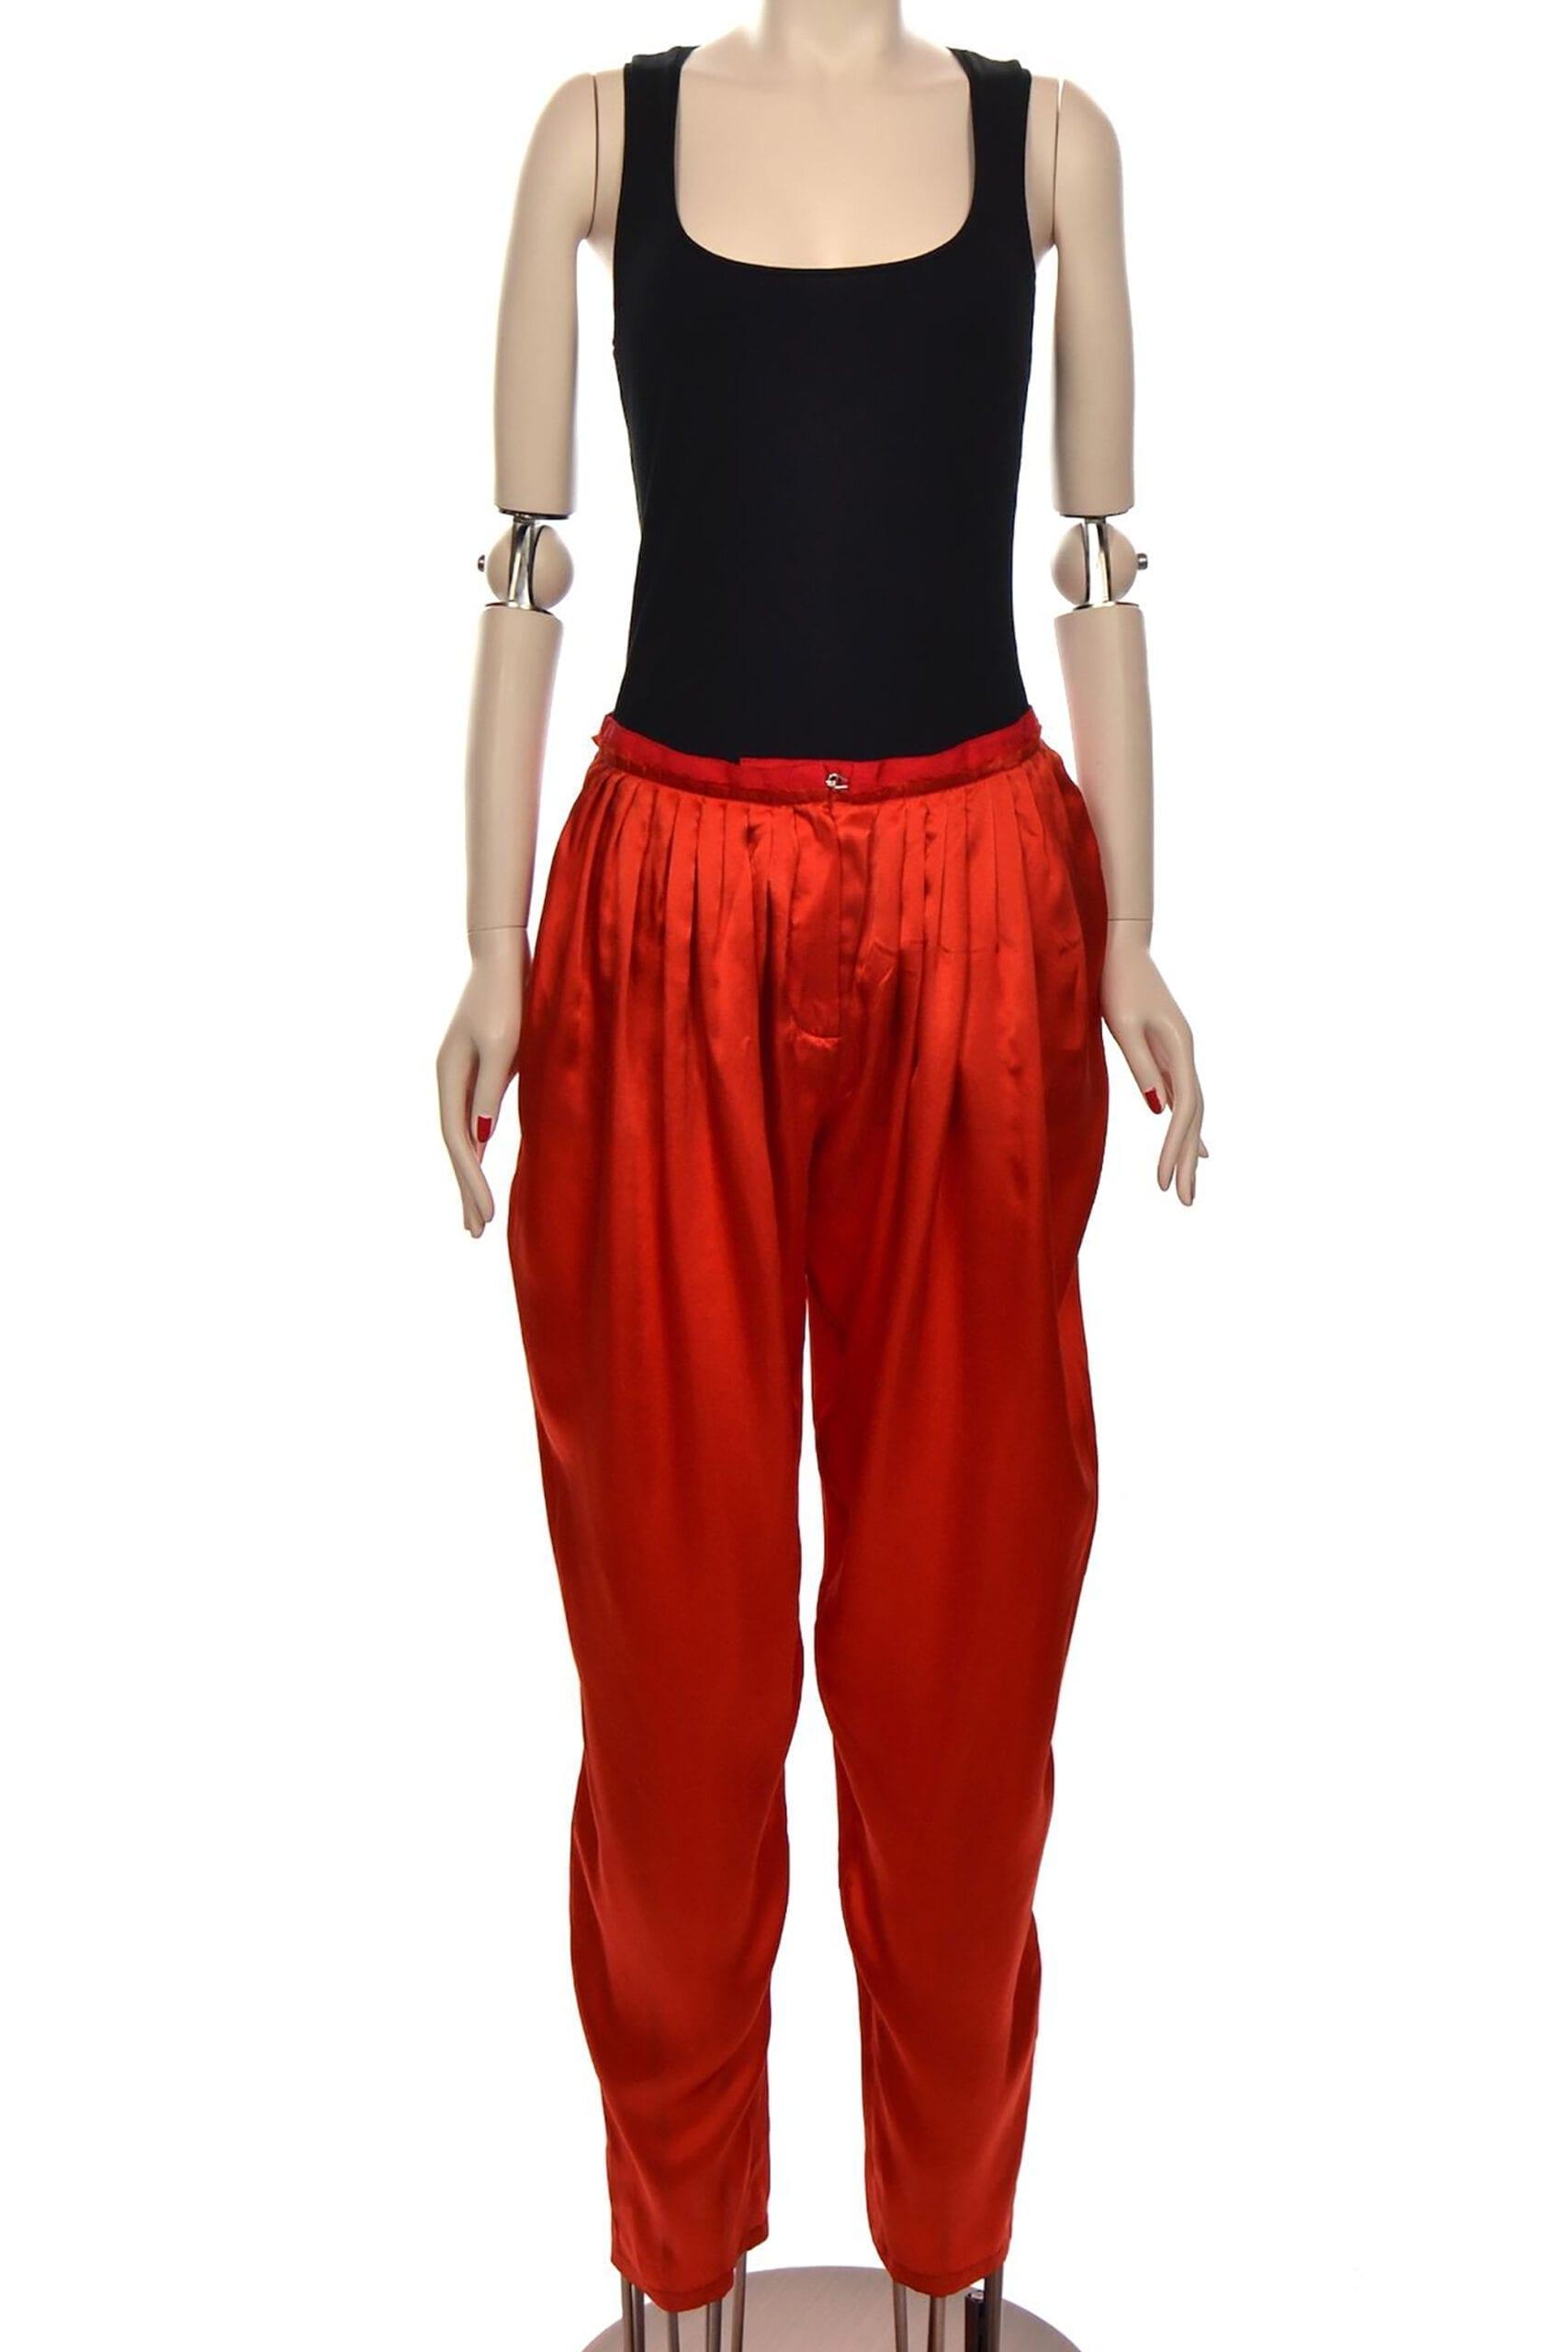 pantaloni raso rossi lavin